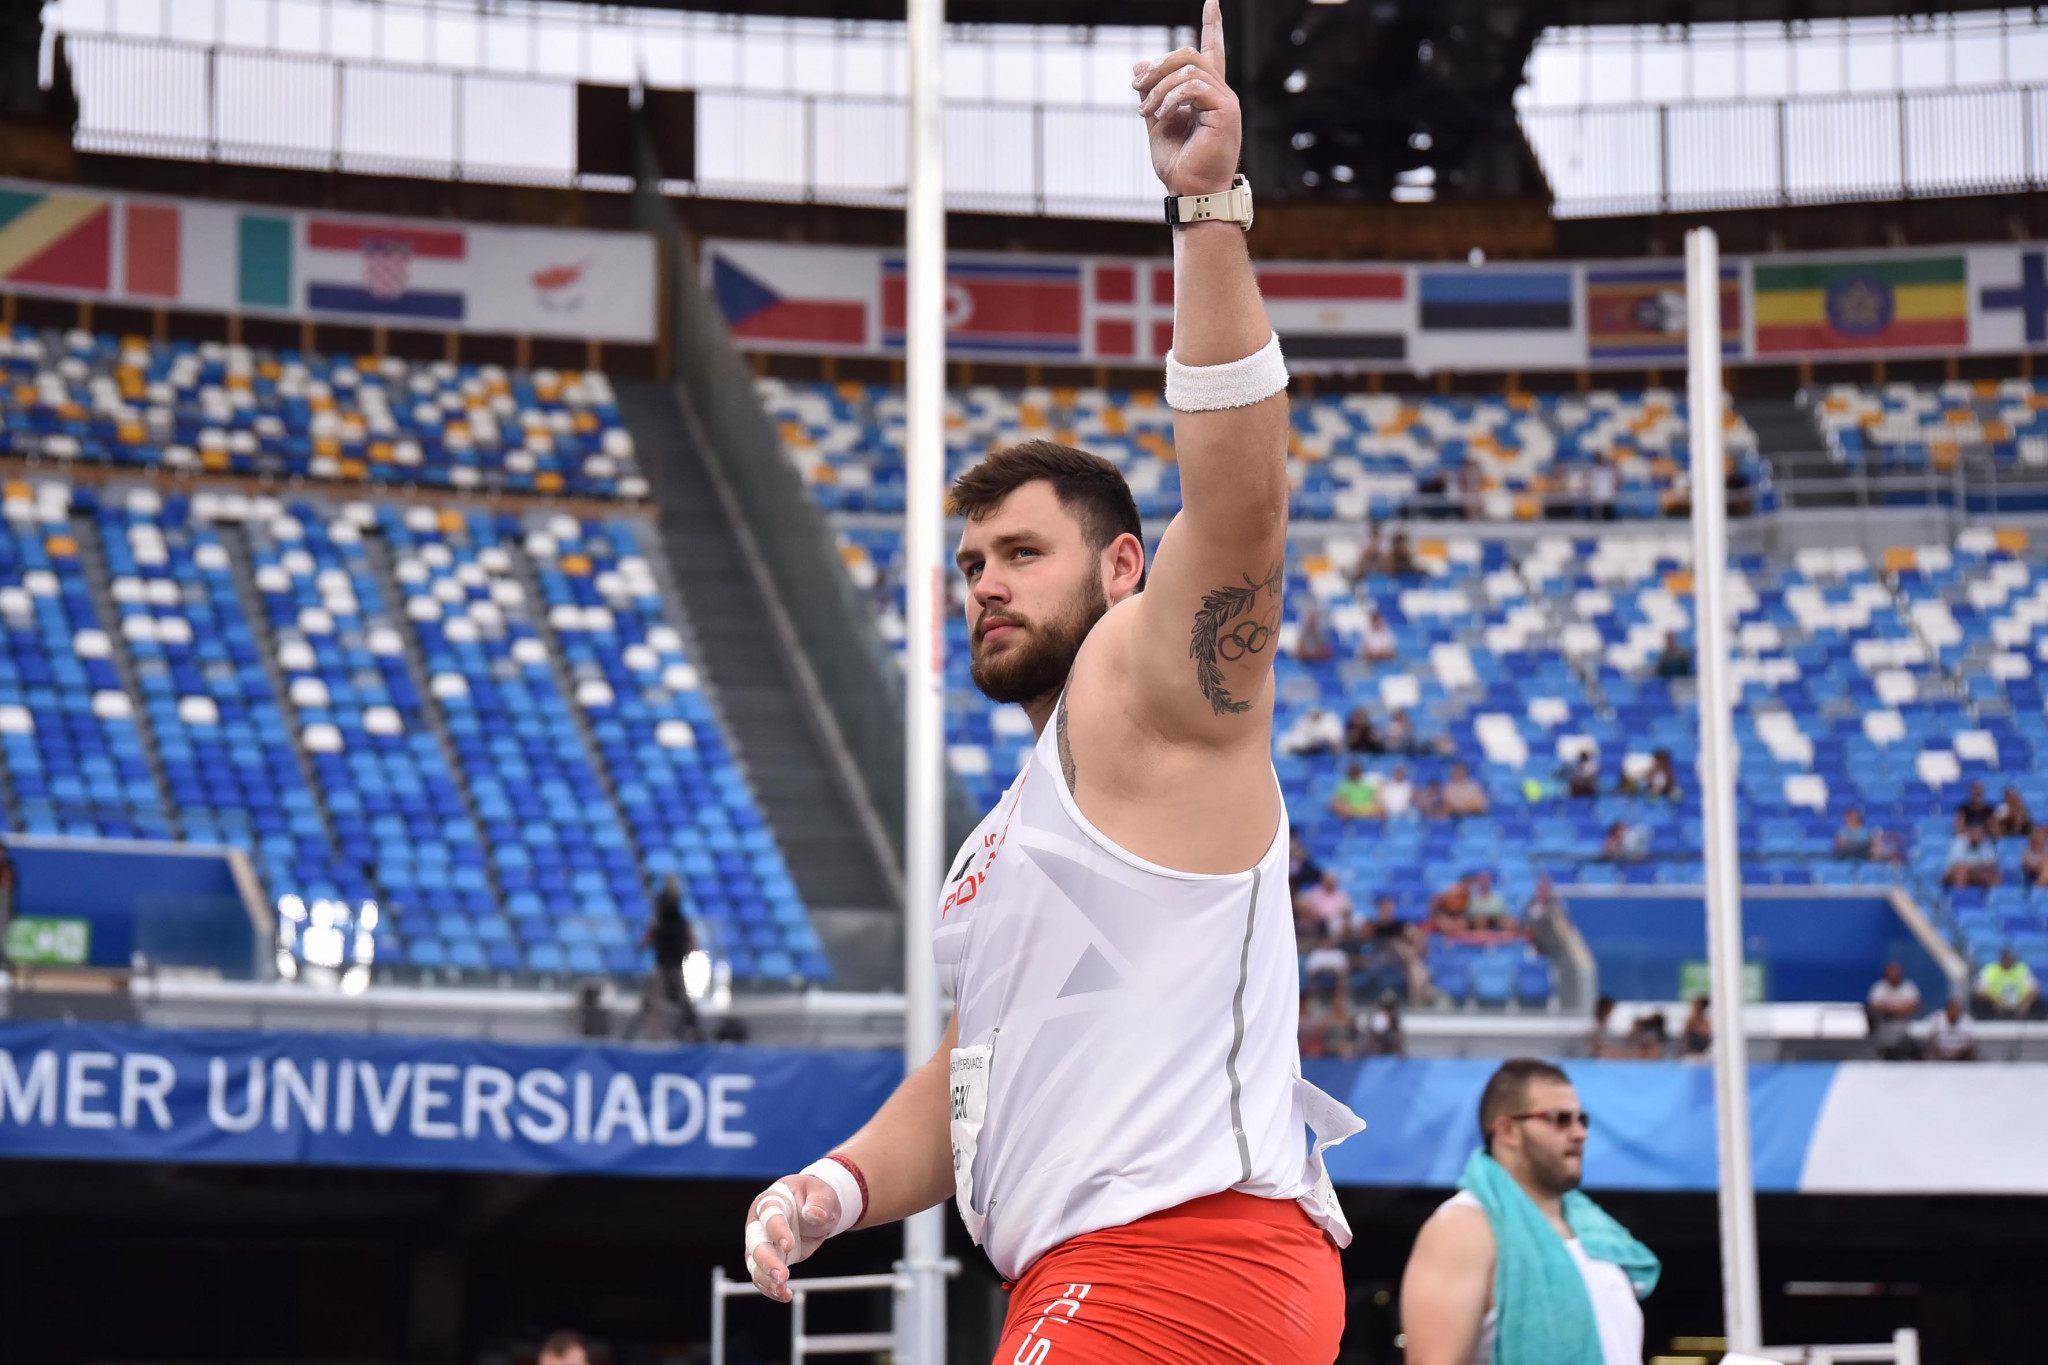 Bukowiecki smashes Universiade shot put record as athletics gets under way at Naples 2019